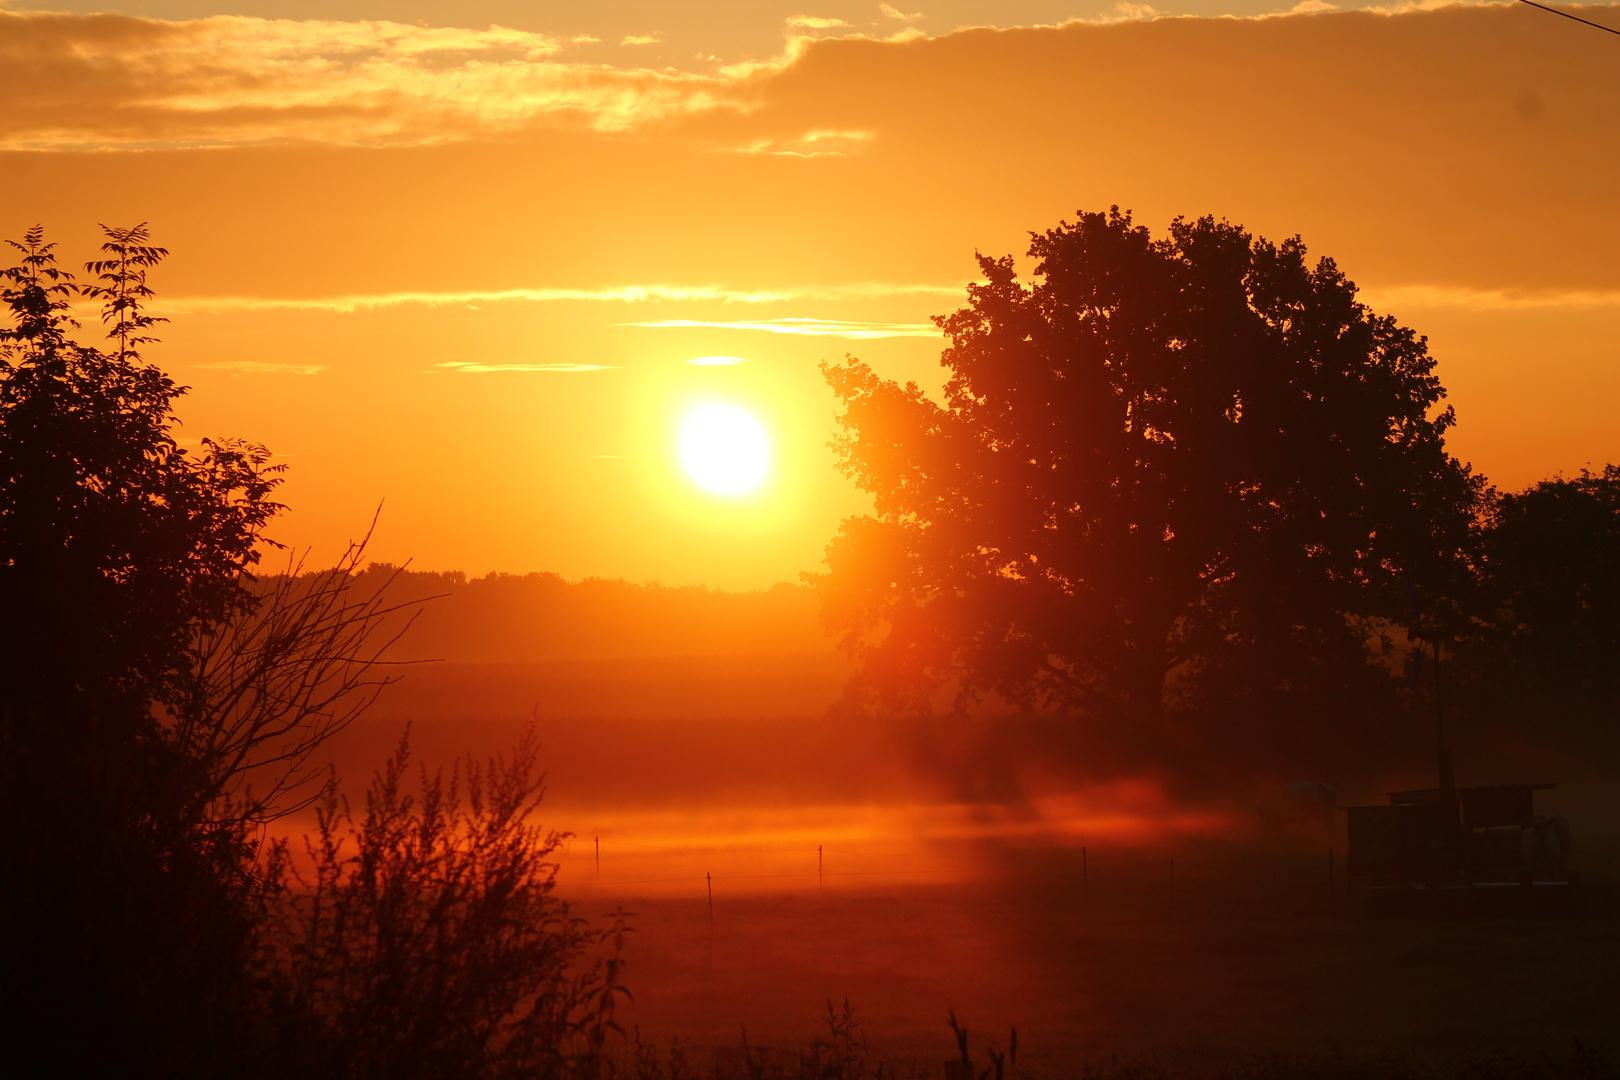 Morgensonne mit Nebel